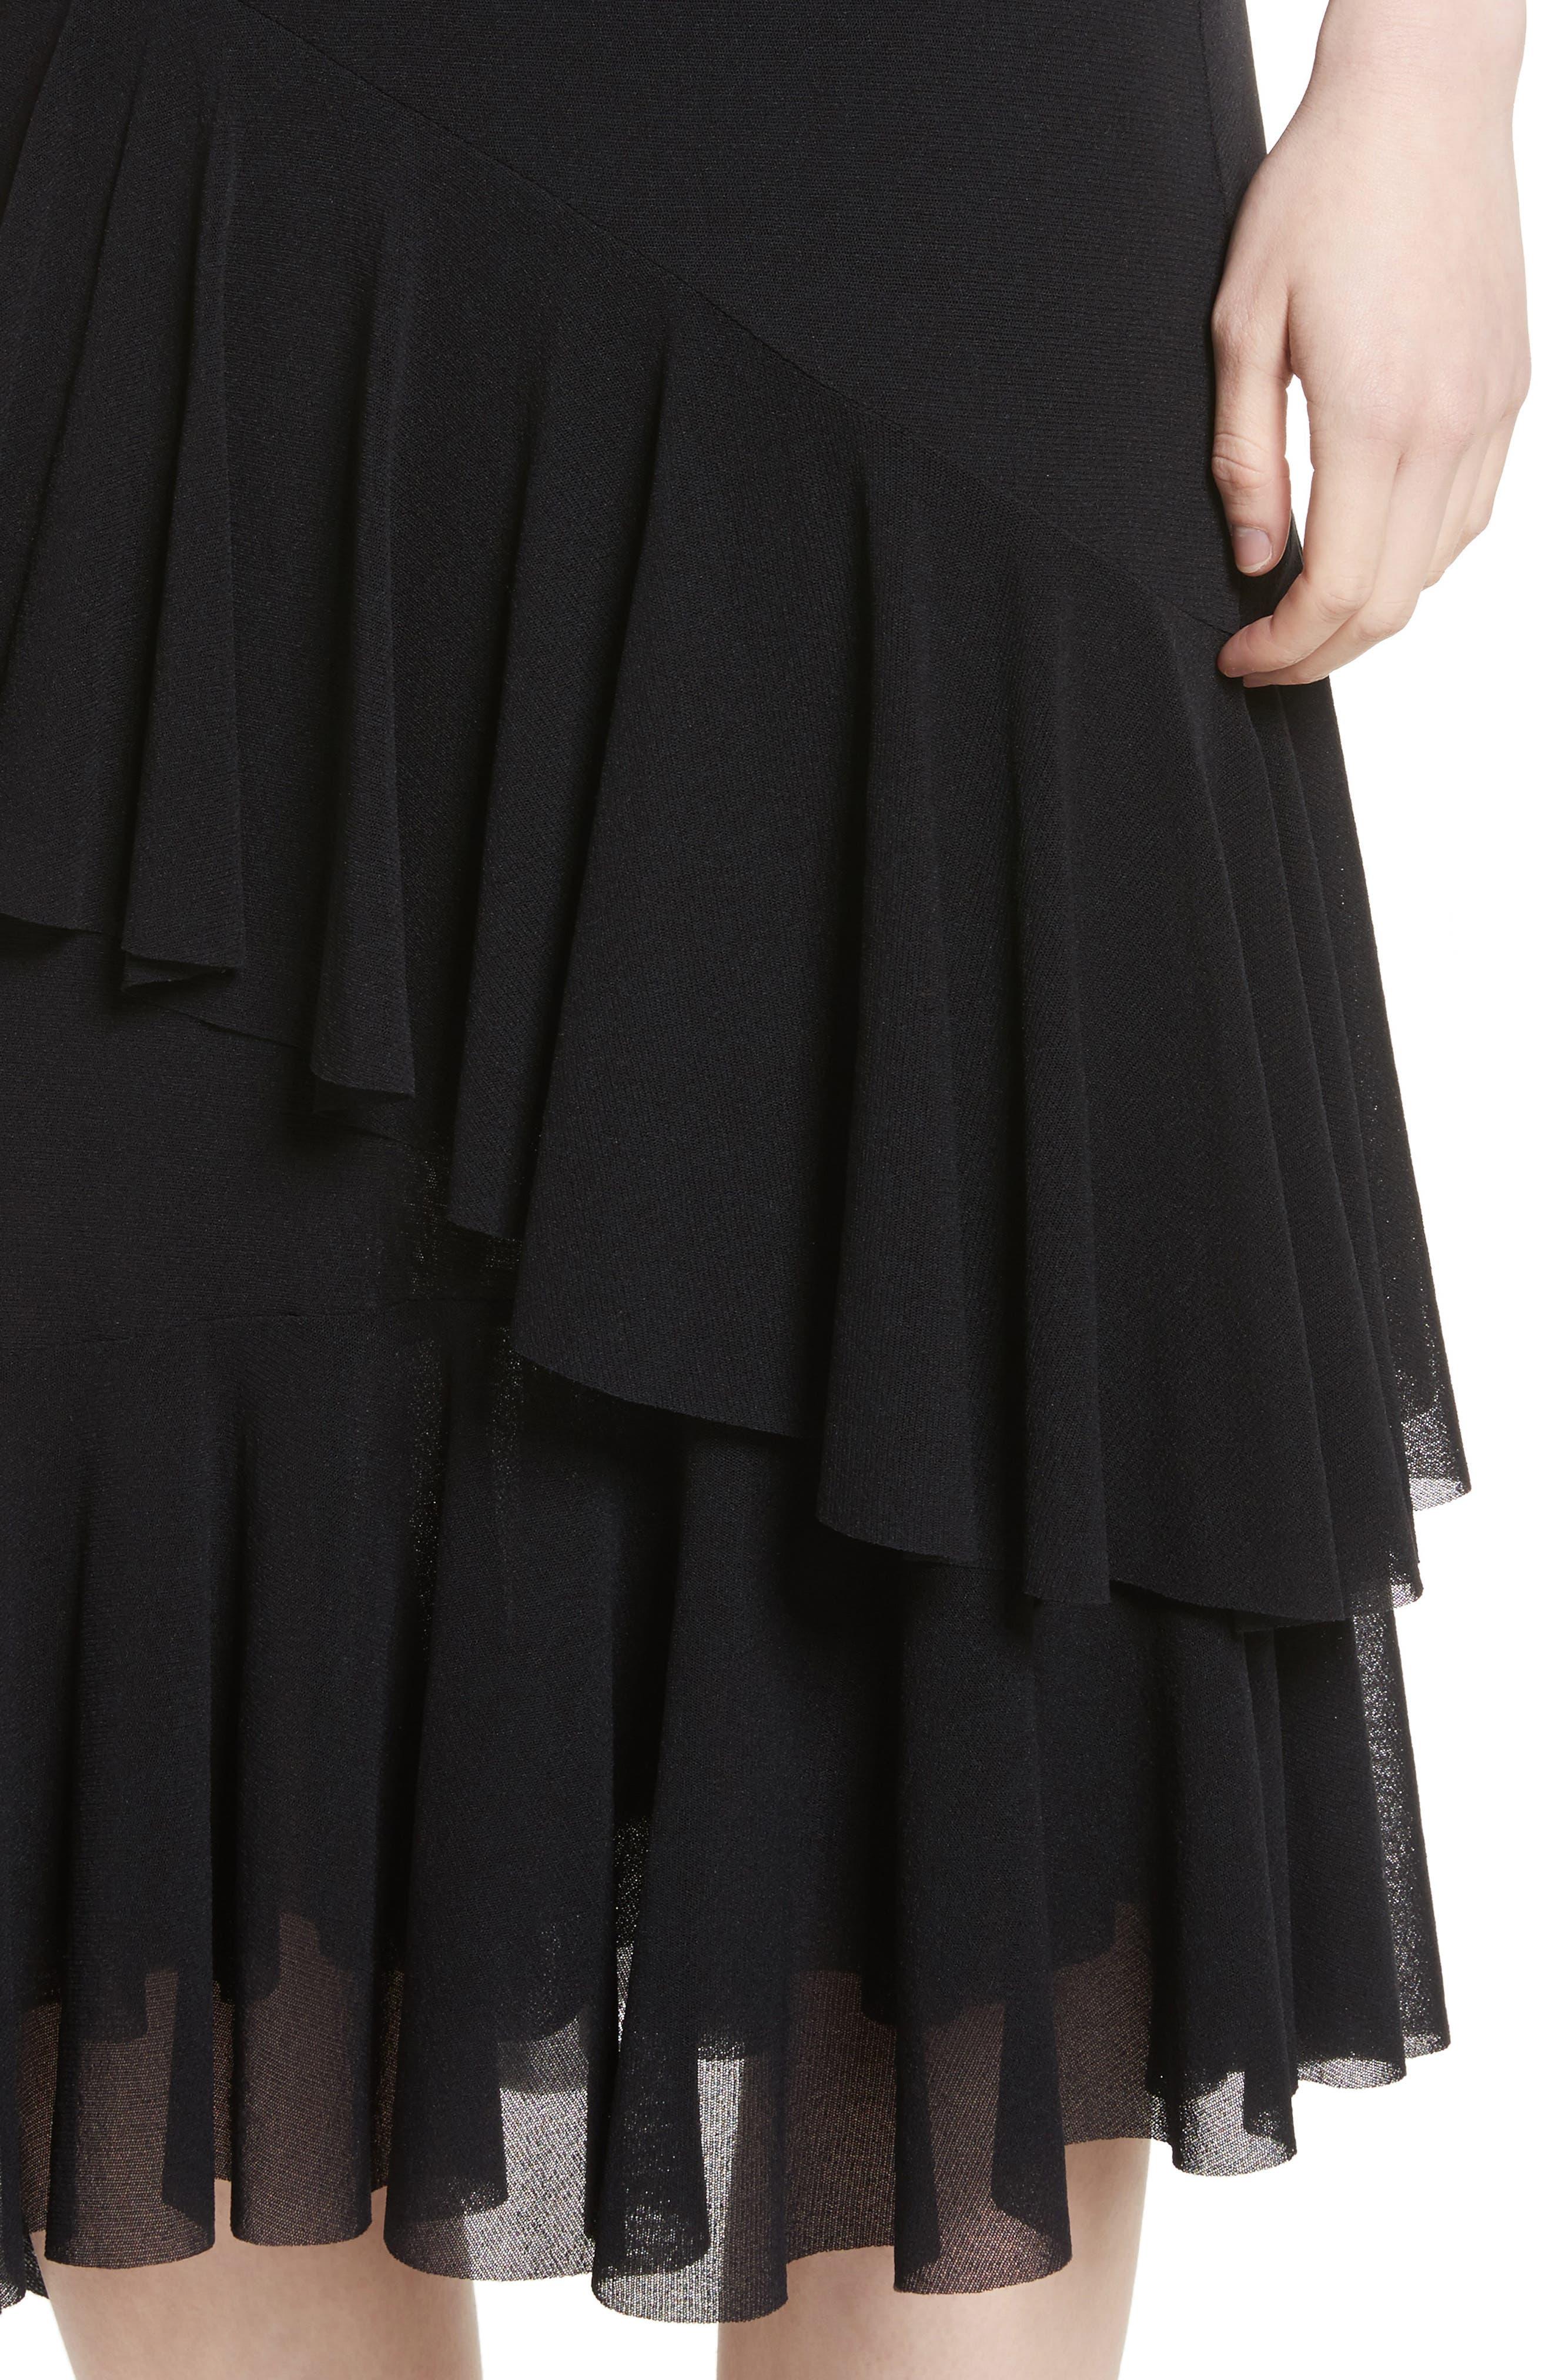 Ruffle Tulle Midi Skirt,                             Alternate thumbnail 4, color,                             NERO